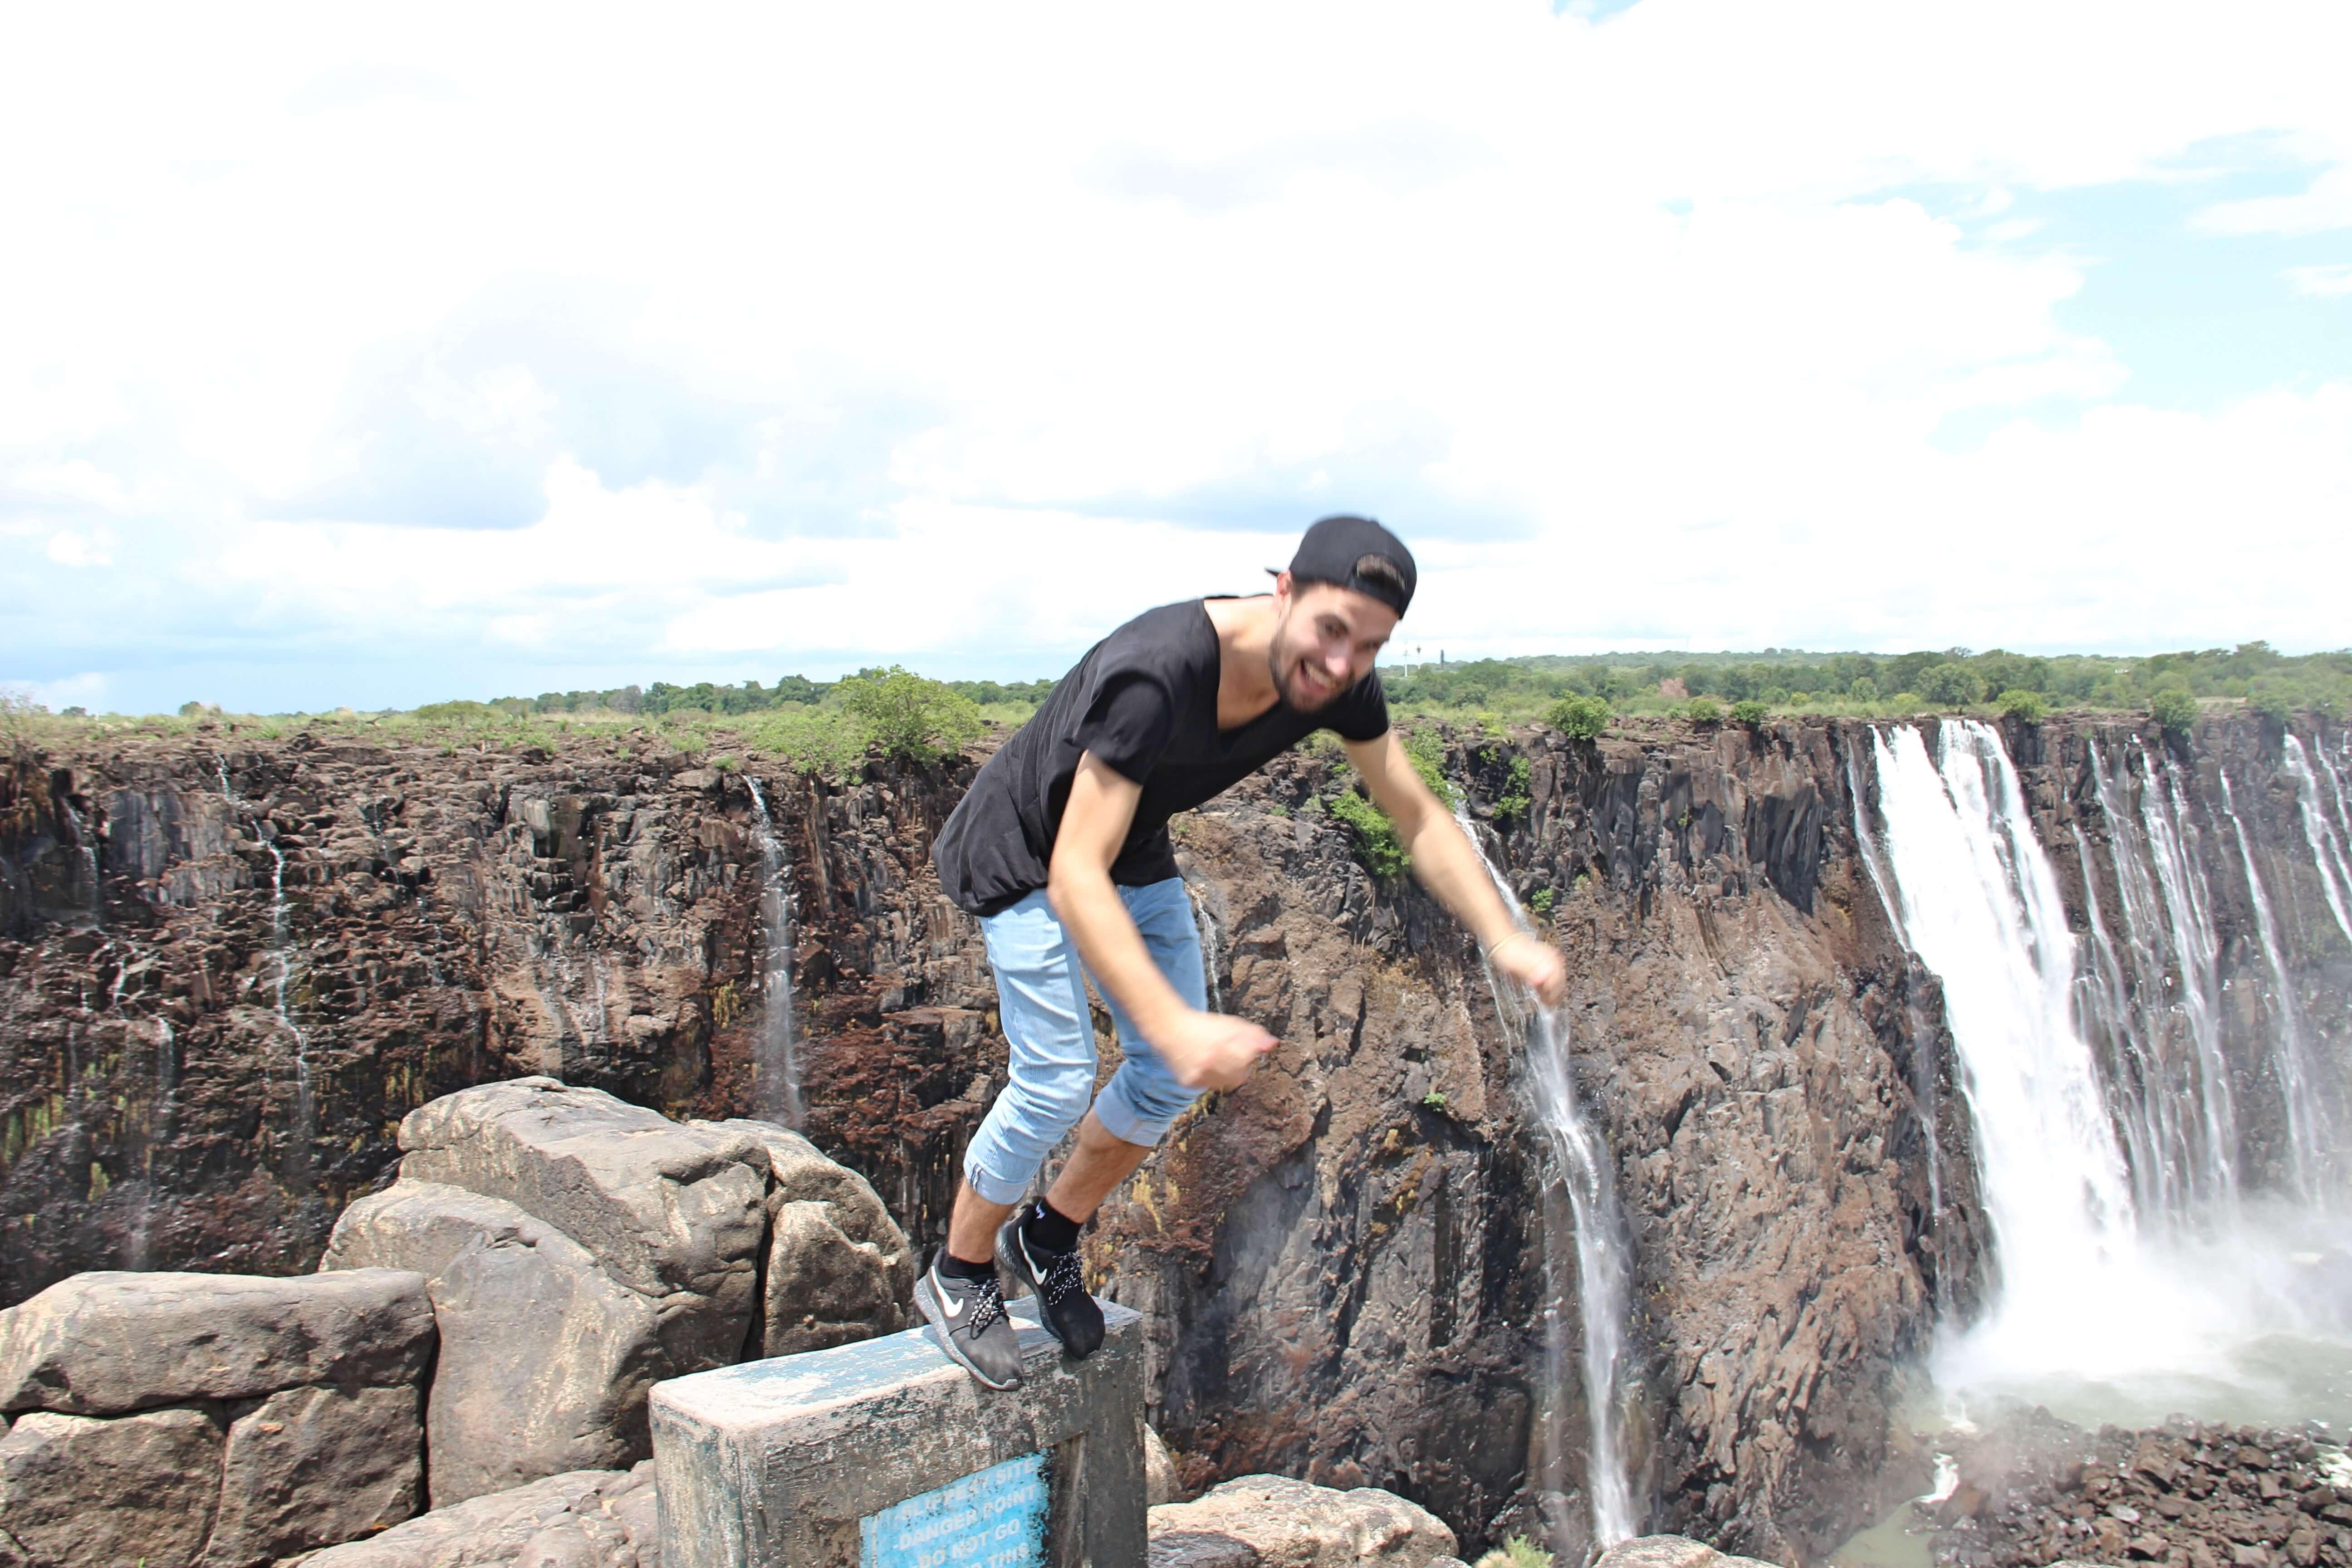 Weltreise_Backpacking_Afrika_Roadtrip_Vicfalls